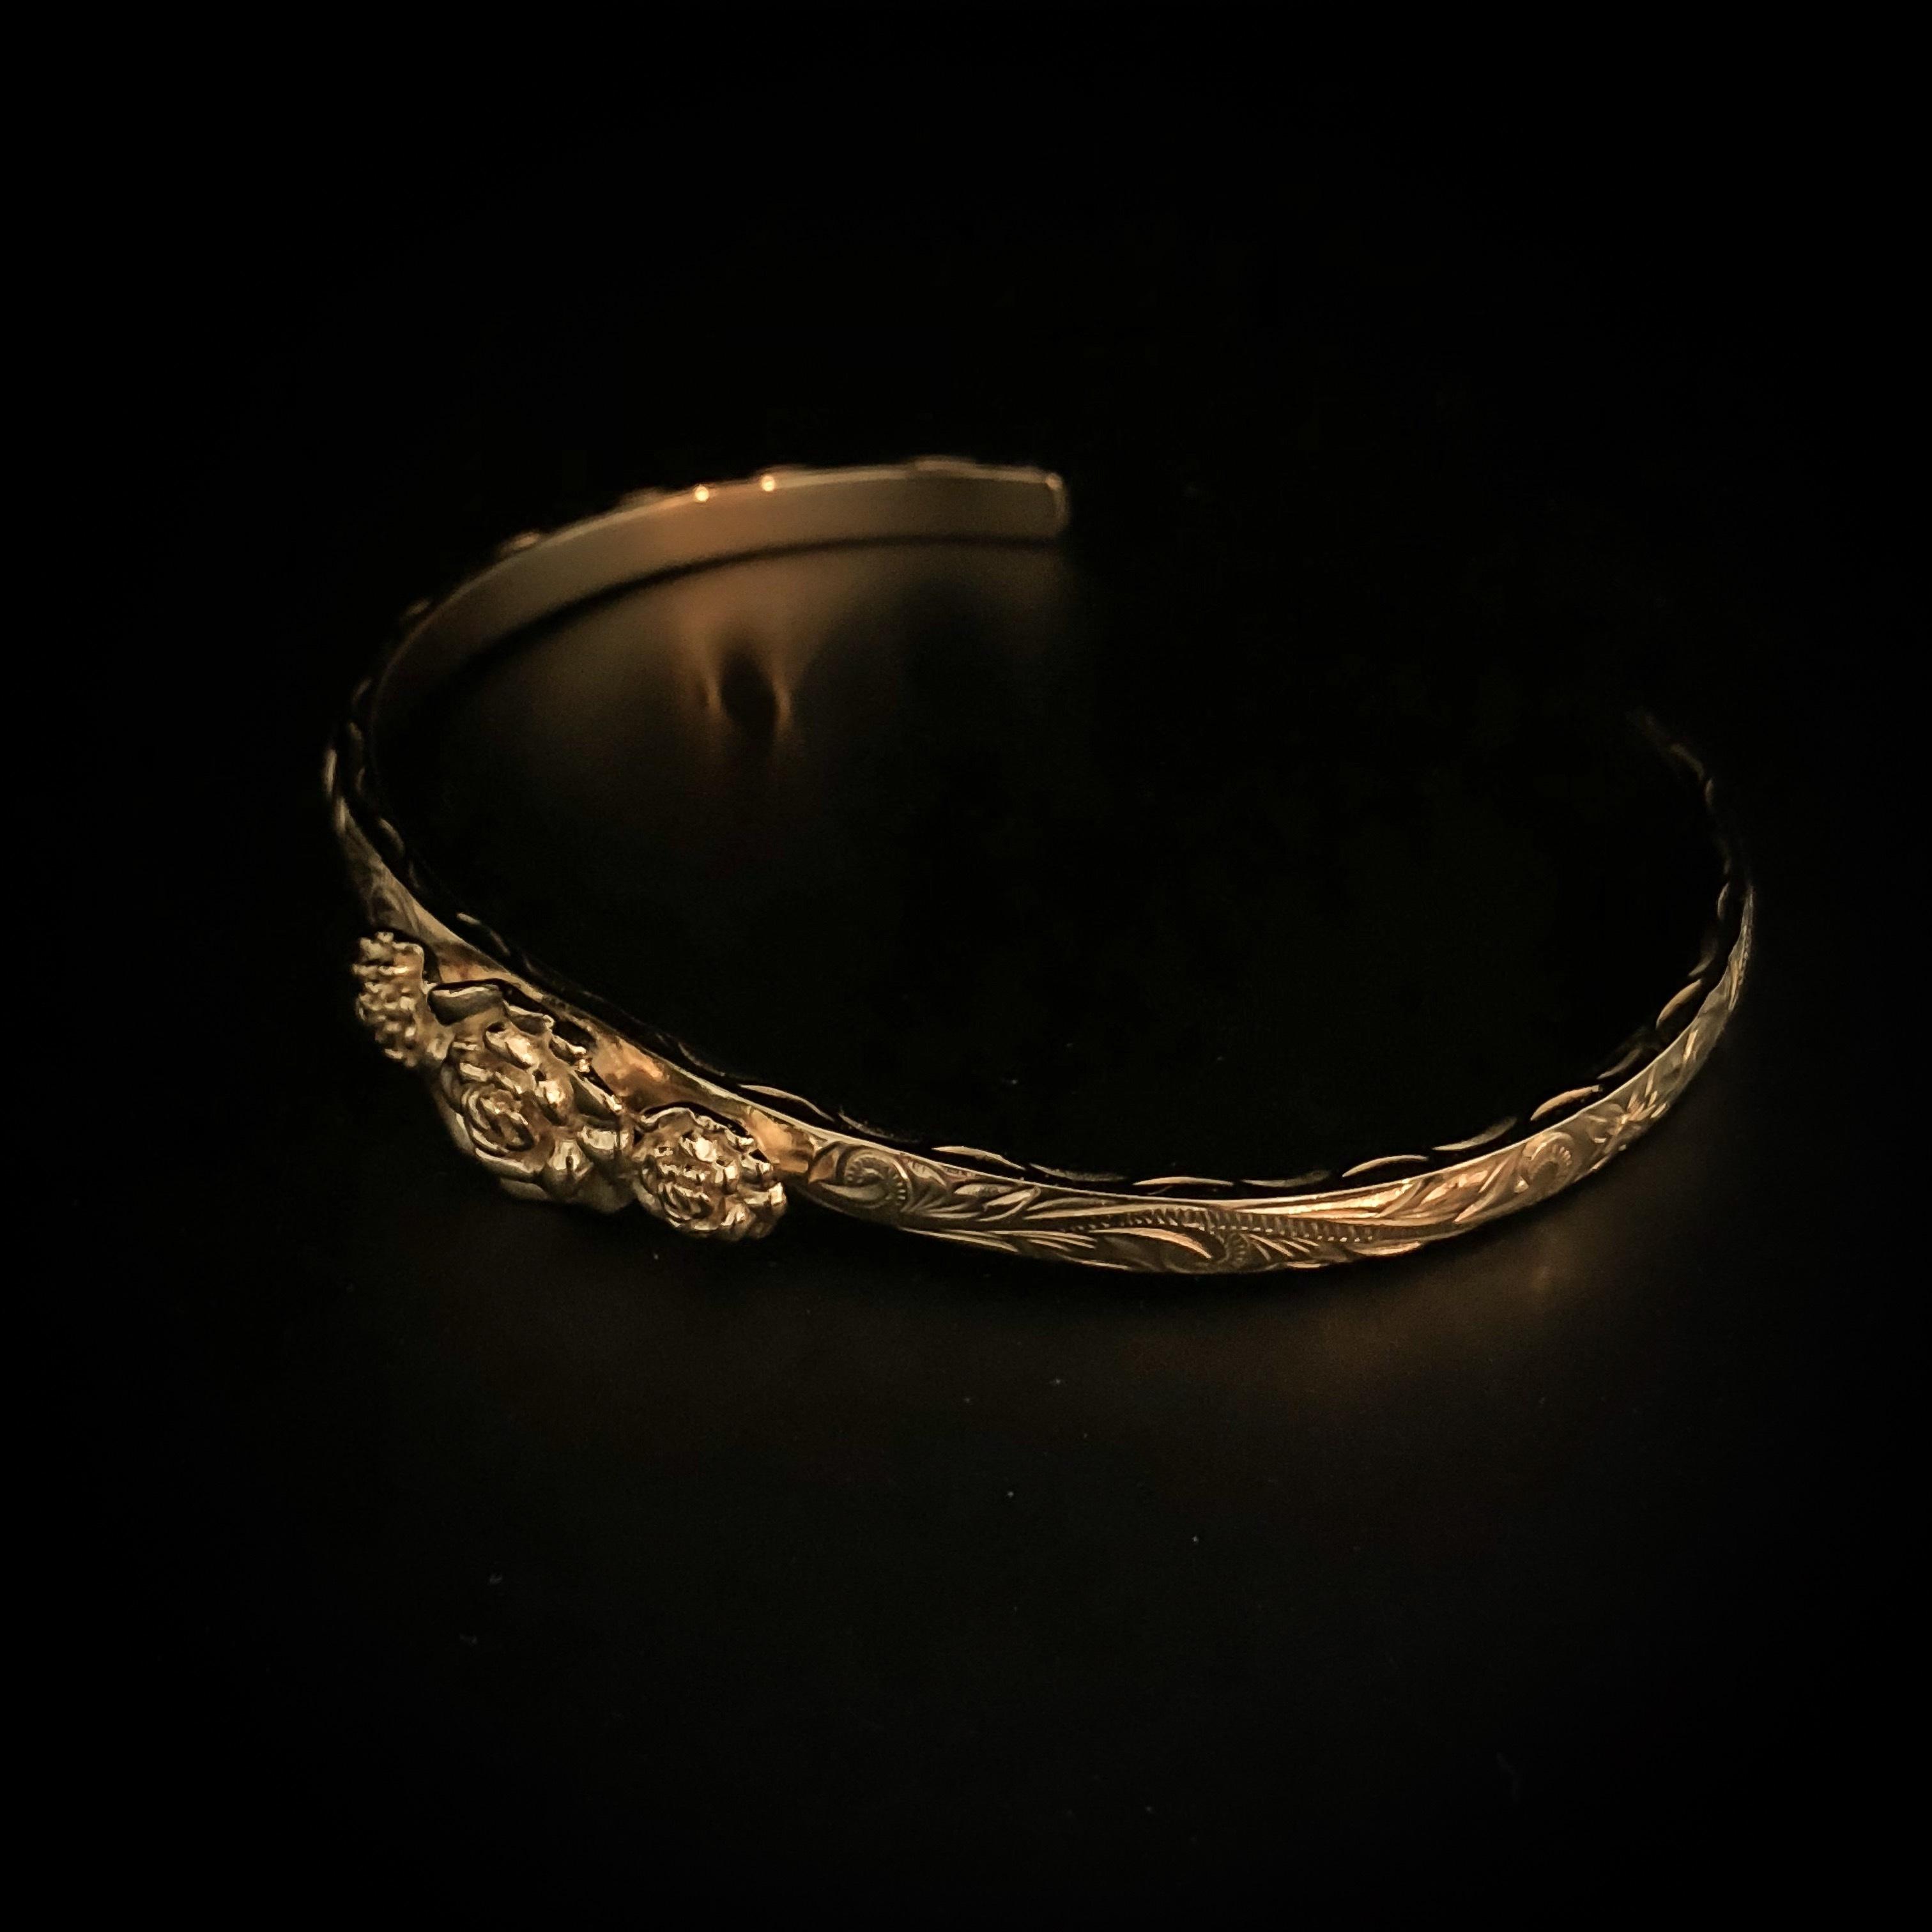 24kgp Hawaiian jewelry bangle(3rose)